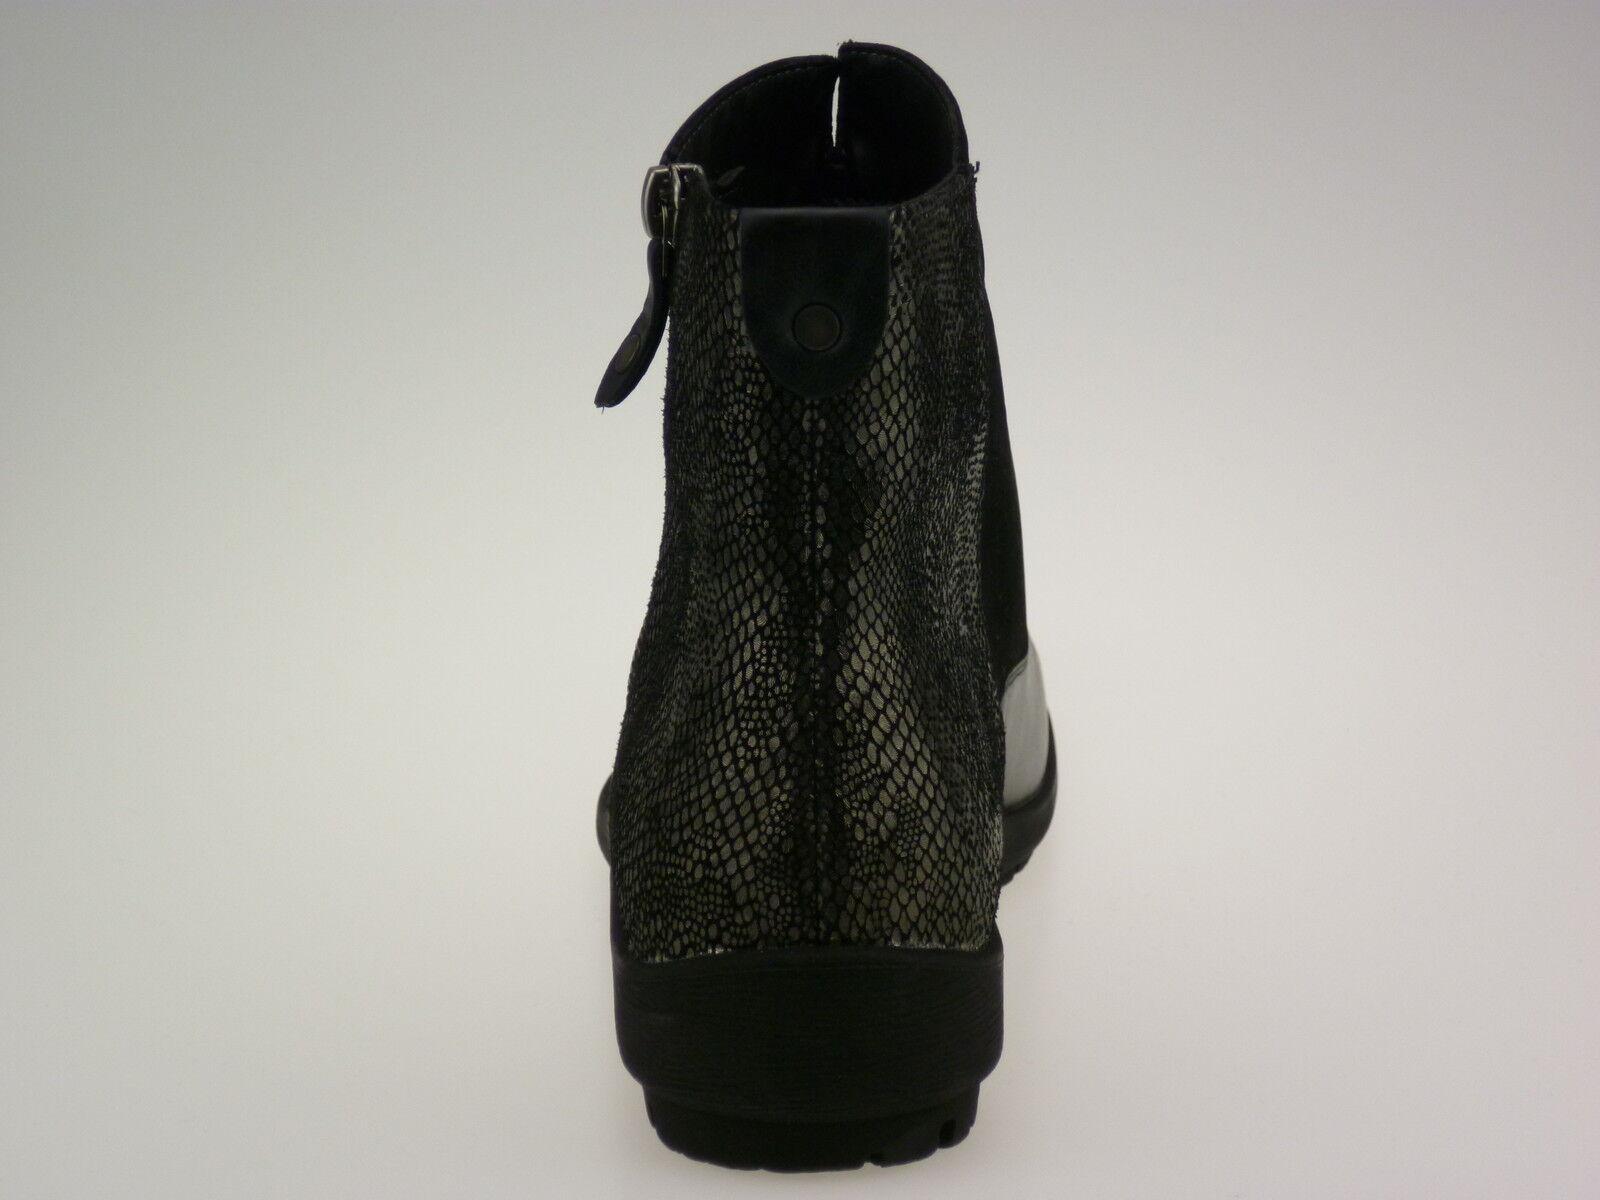 les chaussures en daim bleu va firenze borgo firenze va femmes pompe à bord festonné silhouette a2dba7